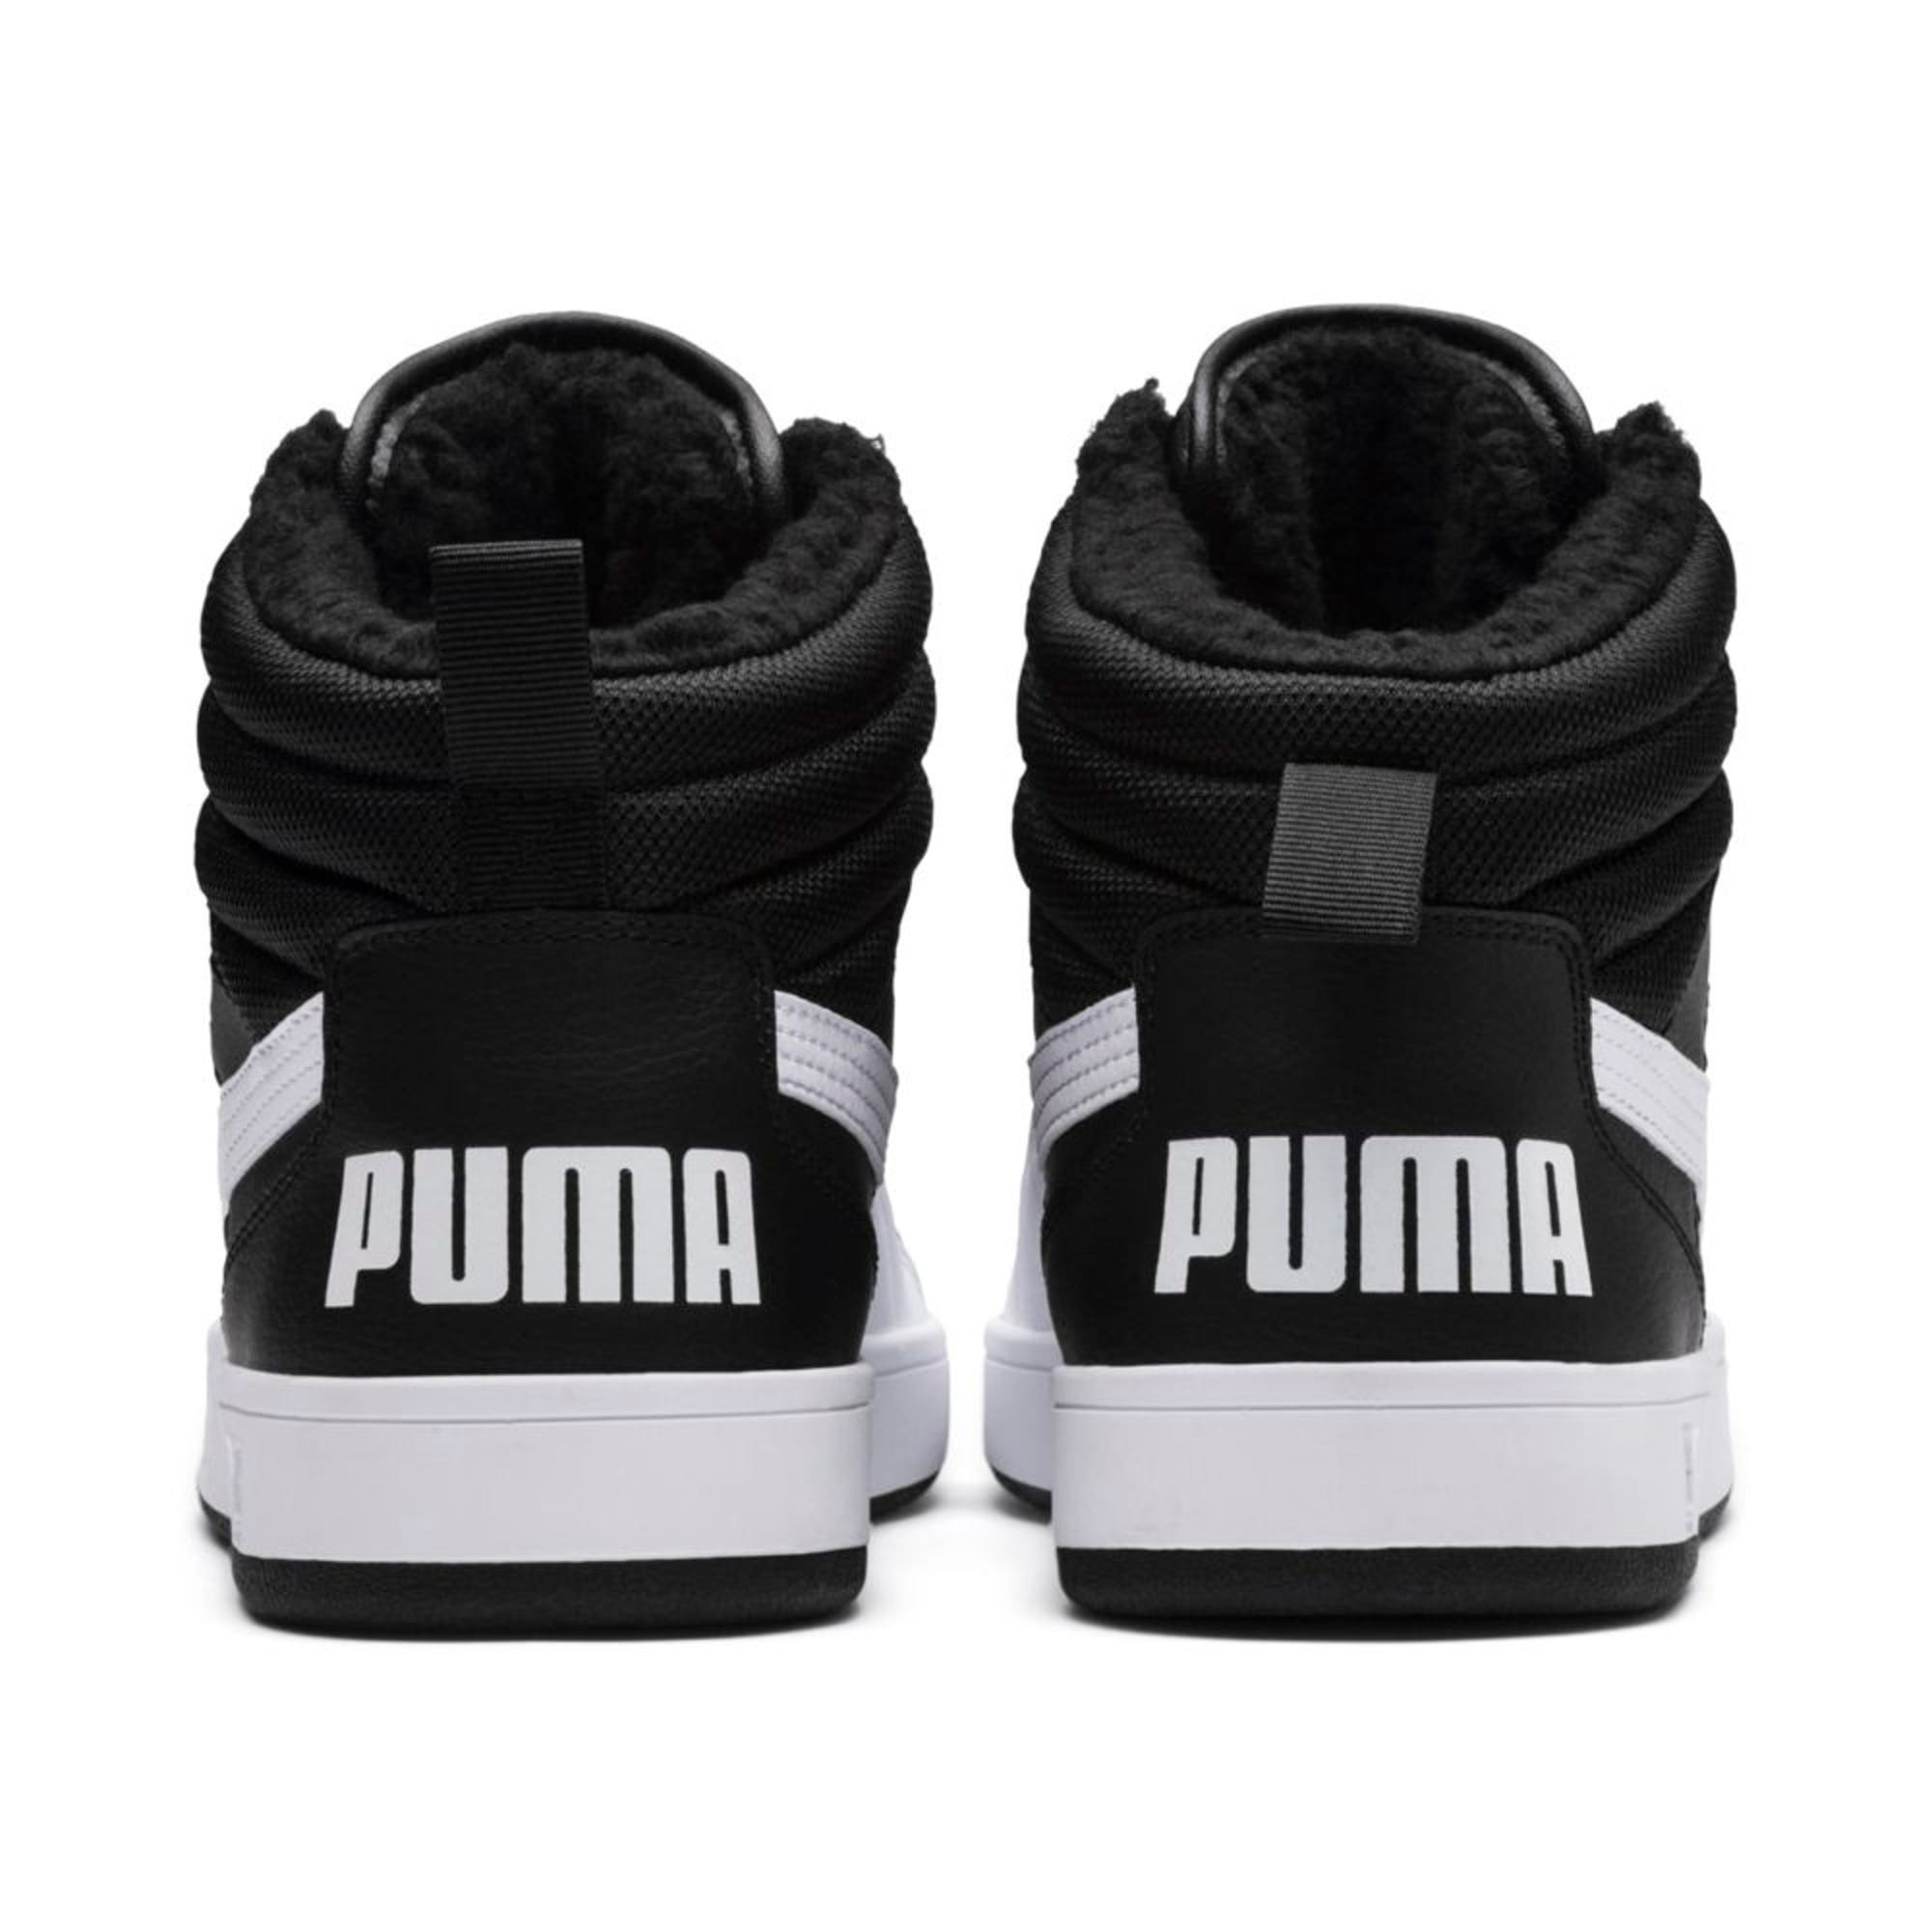 Thumbnail 4 of Rebound Street v2 Fur High Tops, Puma Black-Puma White, medium-IND